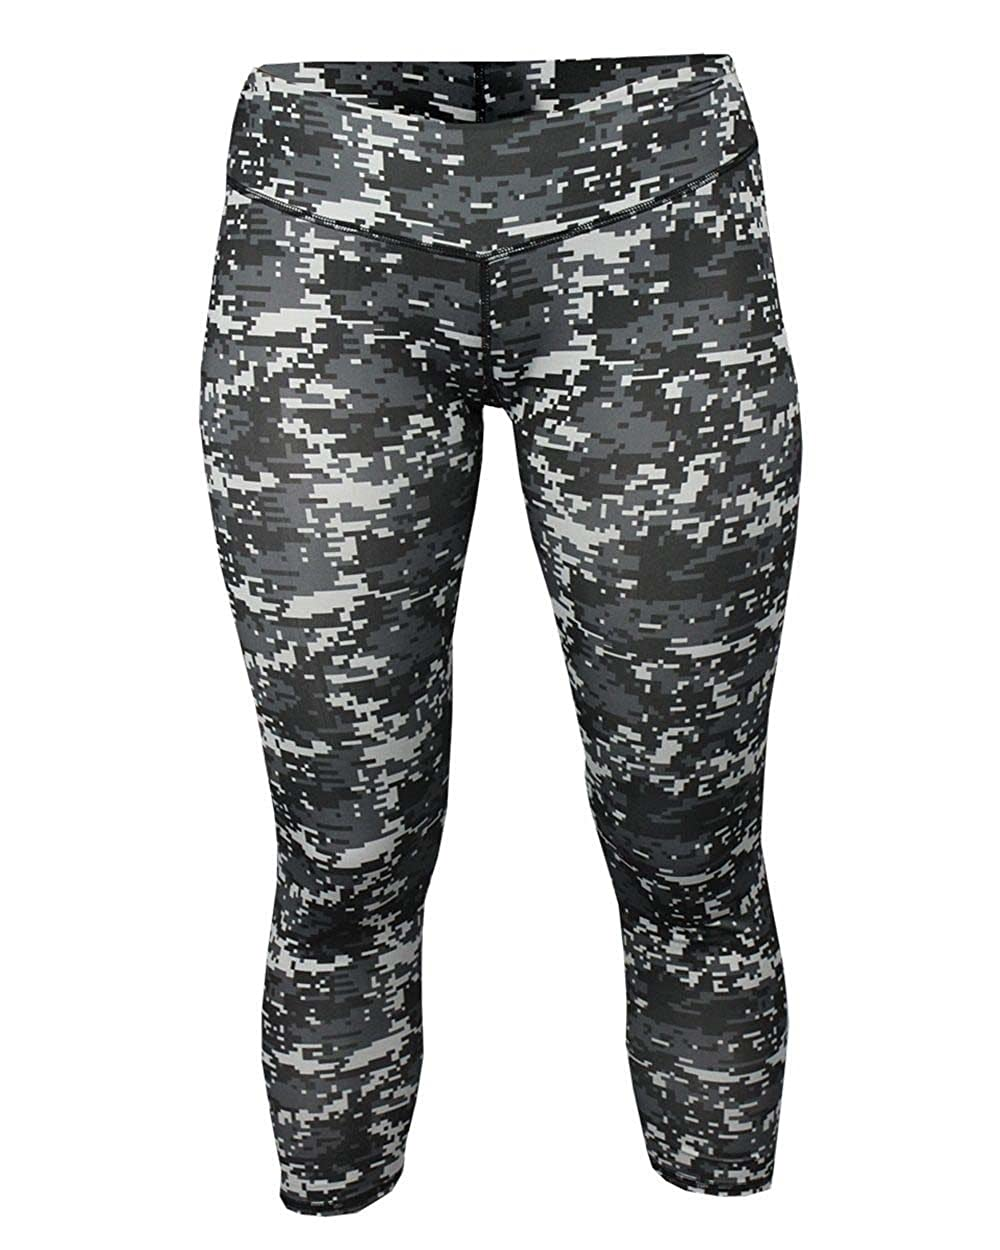 874a6587b54bdc Badger Womens Digital Tights (4619) -BLACK -XS at Amazon Women's Clothing  store: